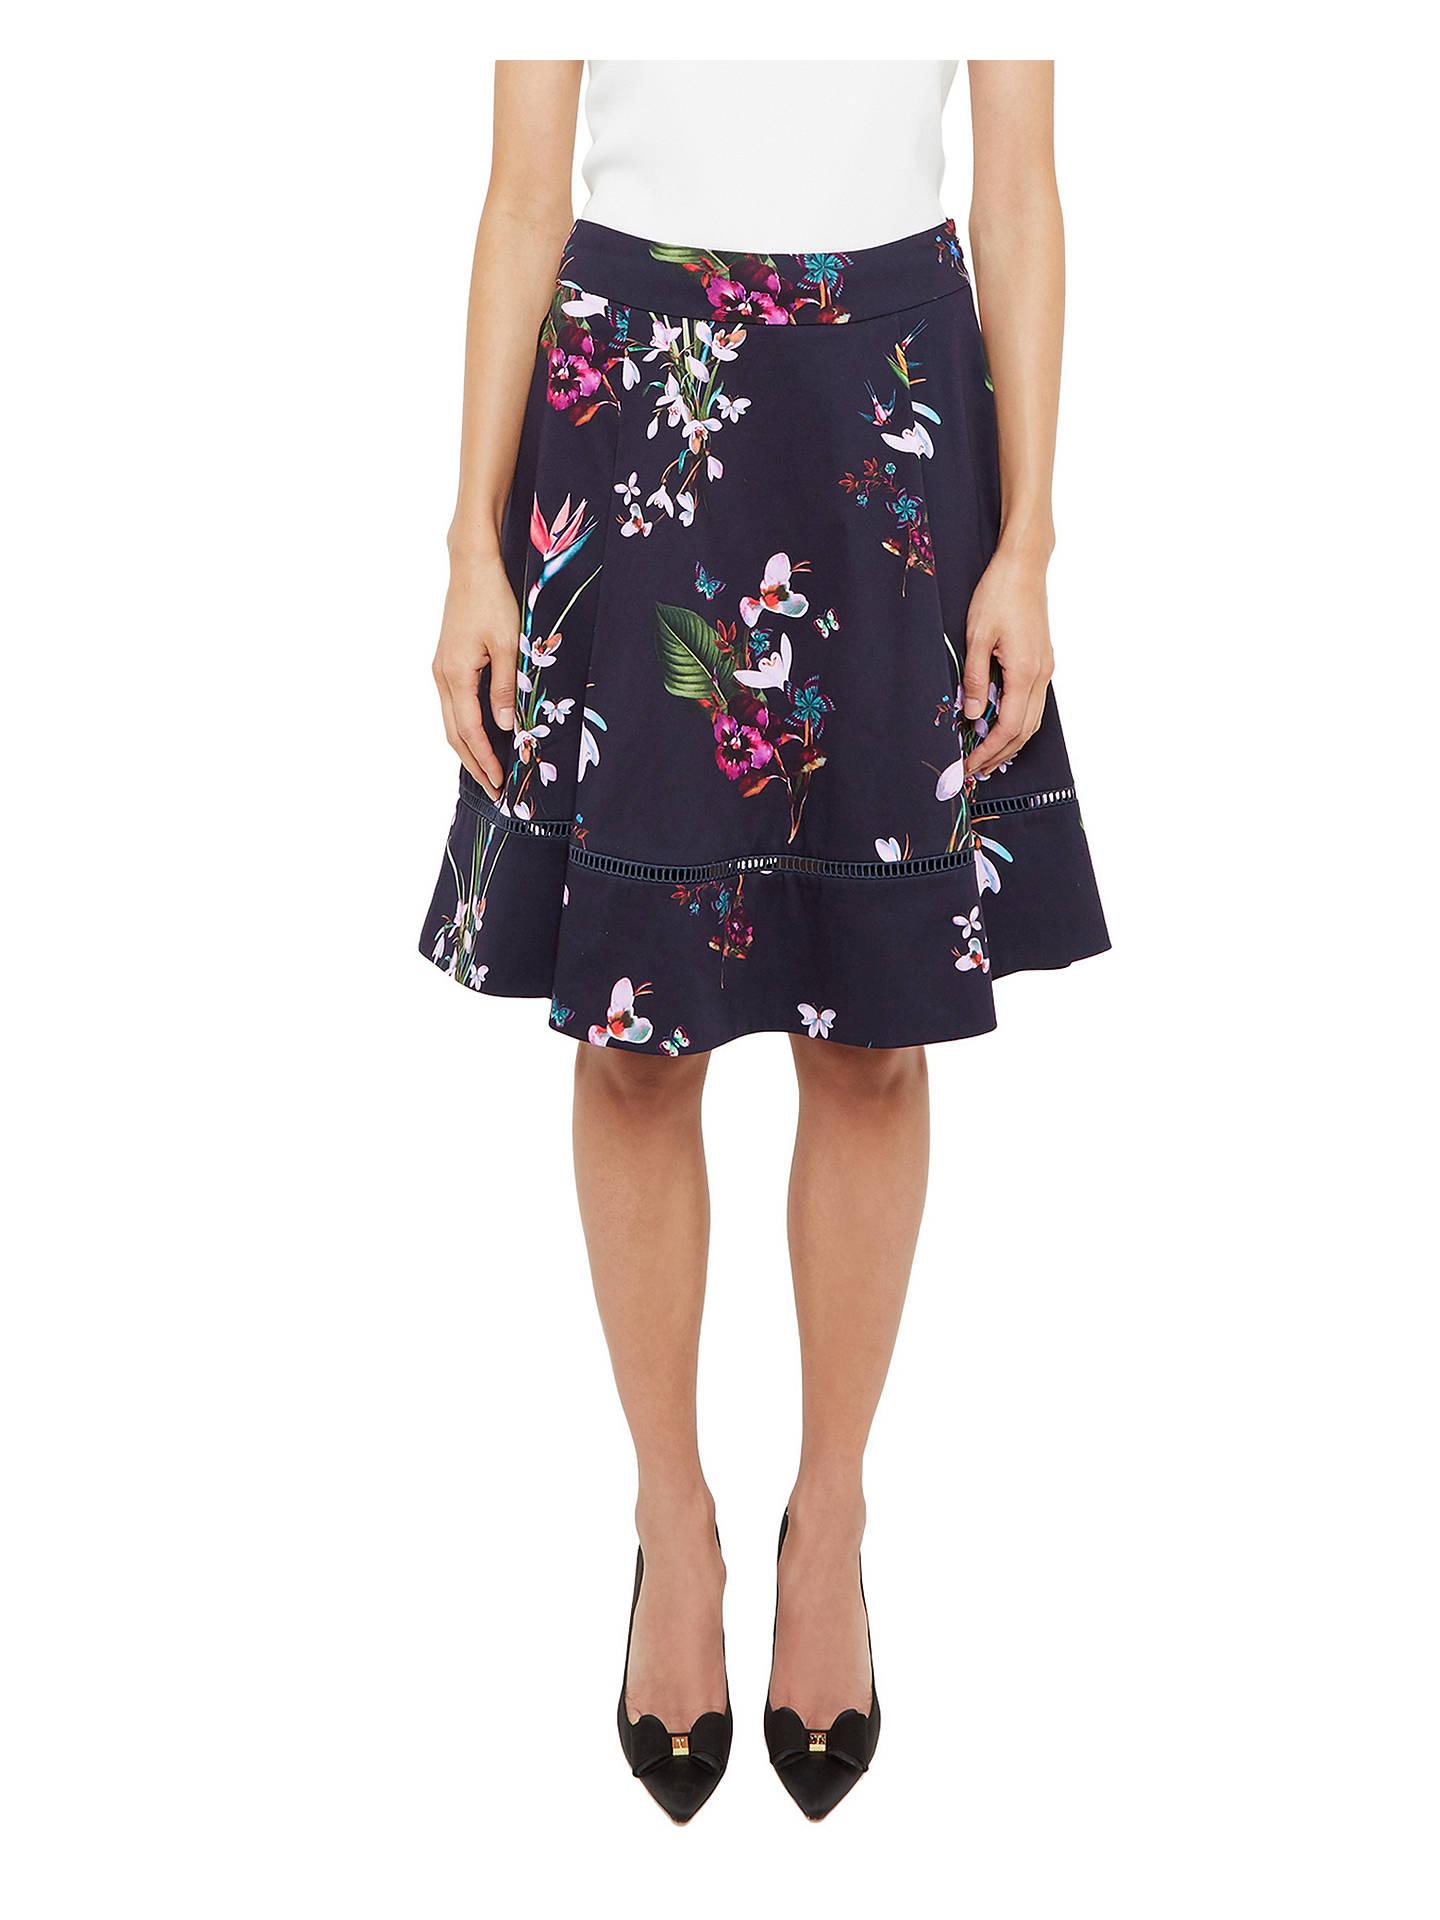 4c2259572 Buy Ted Baker Plio Tropical Oasis Dipped Hem Skirt